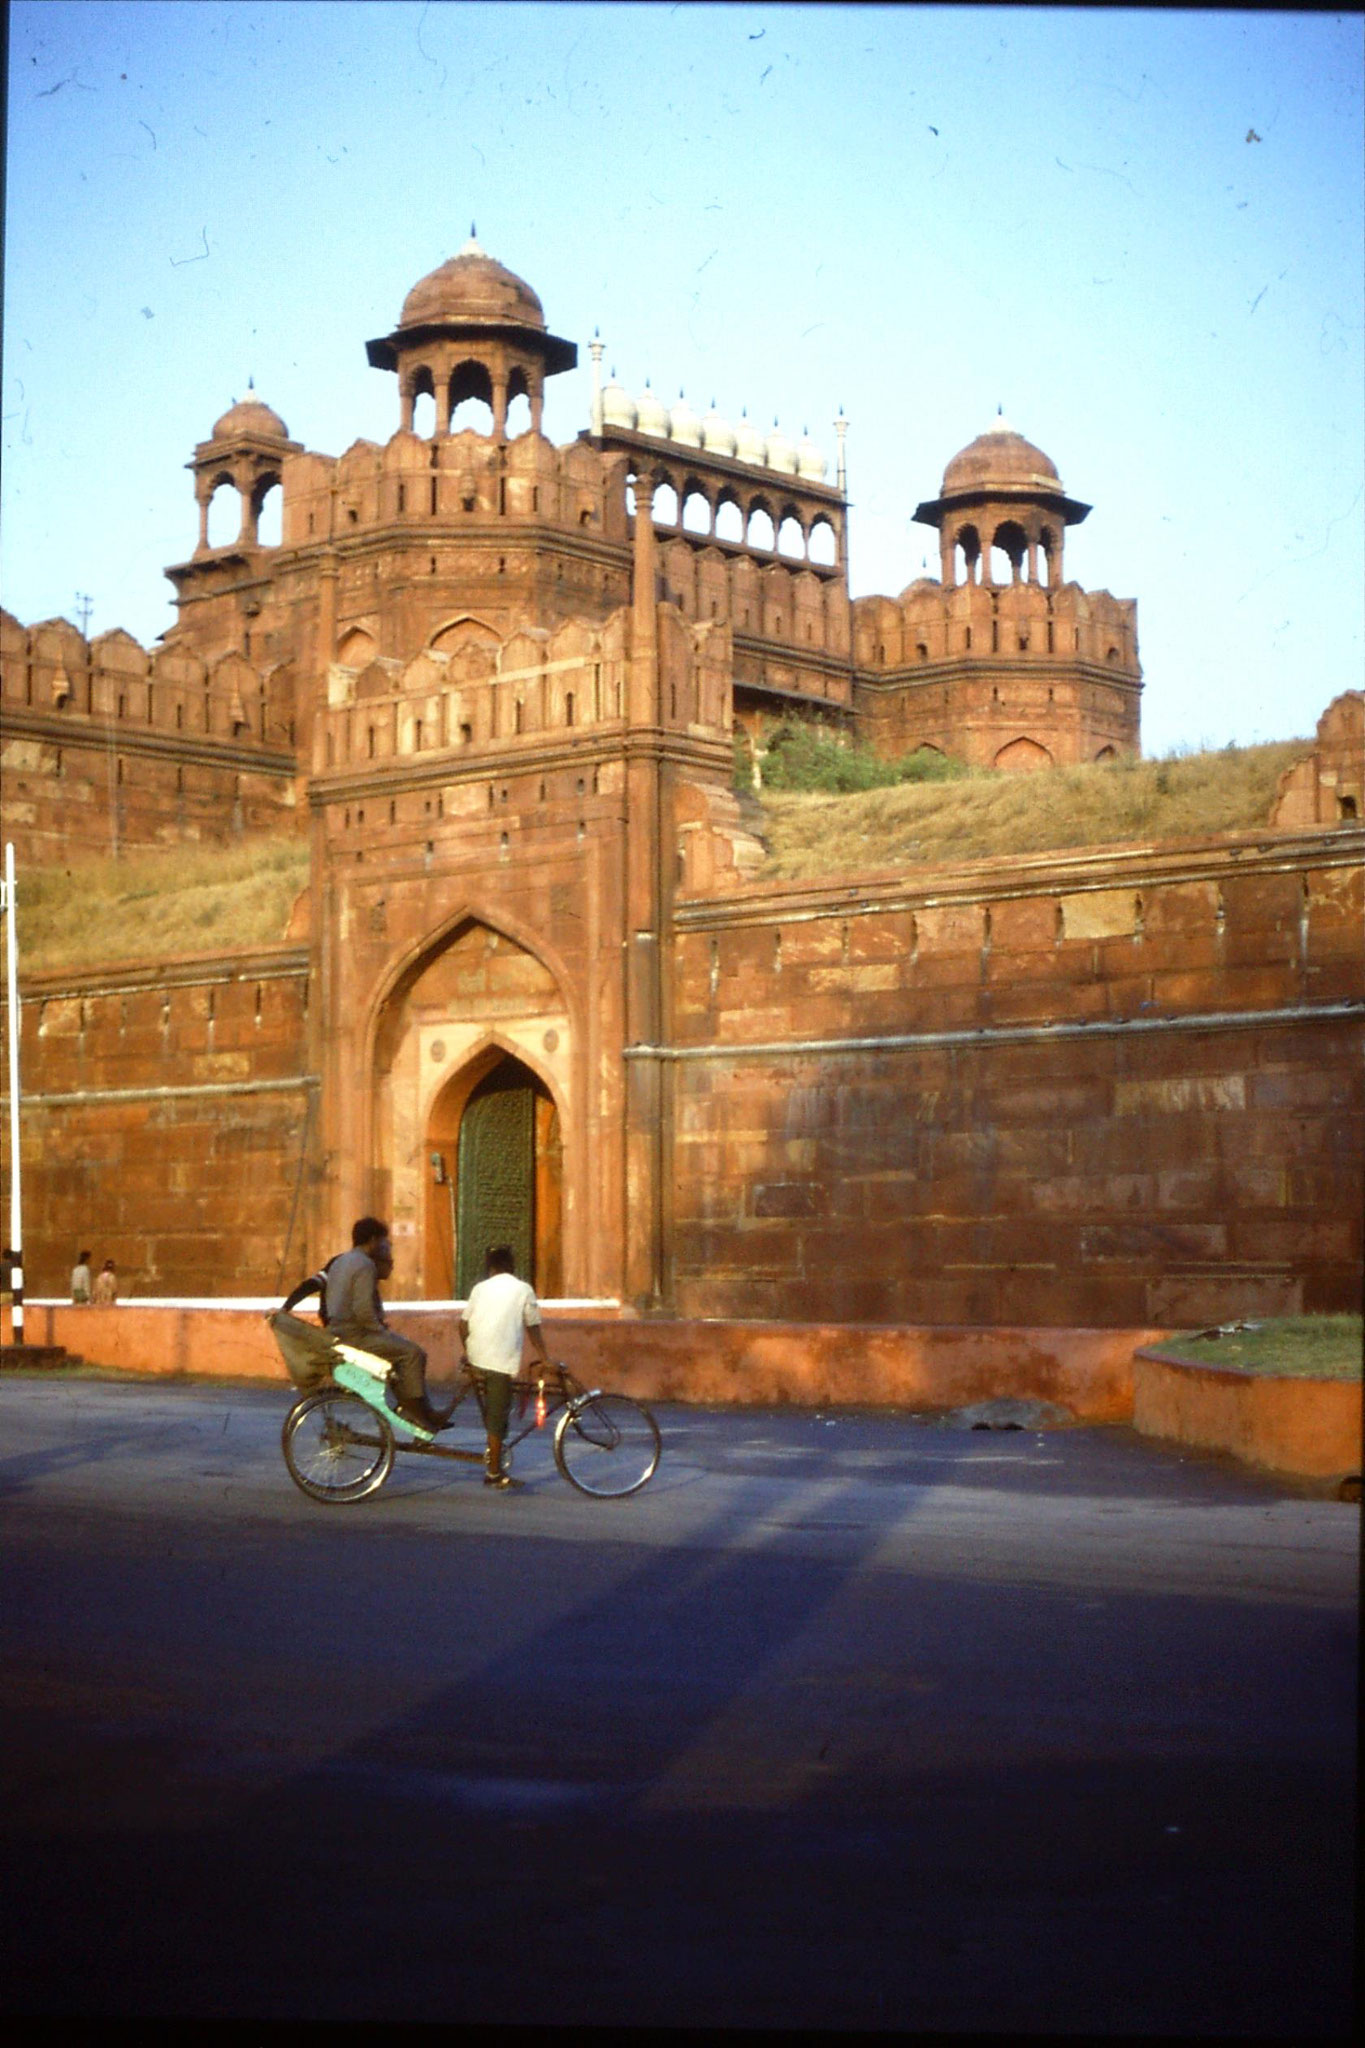 24/11/1989: 26: Delhi Red Fort gate